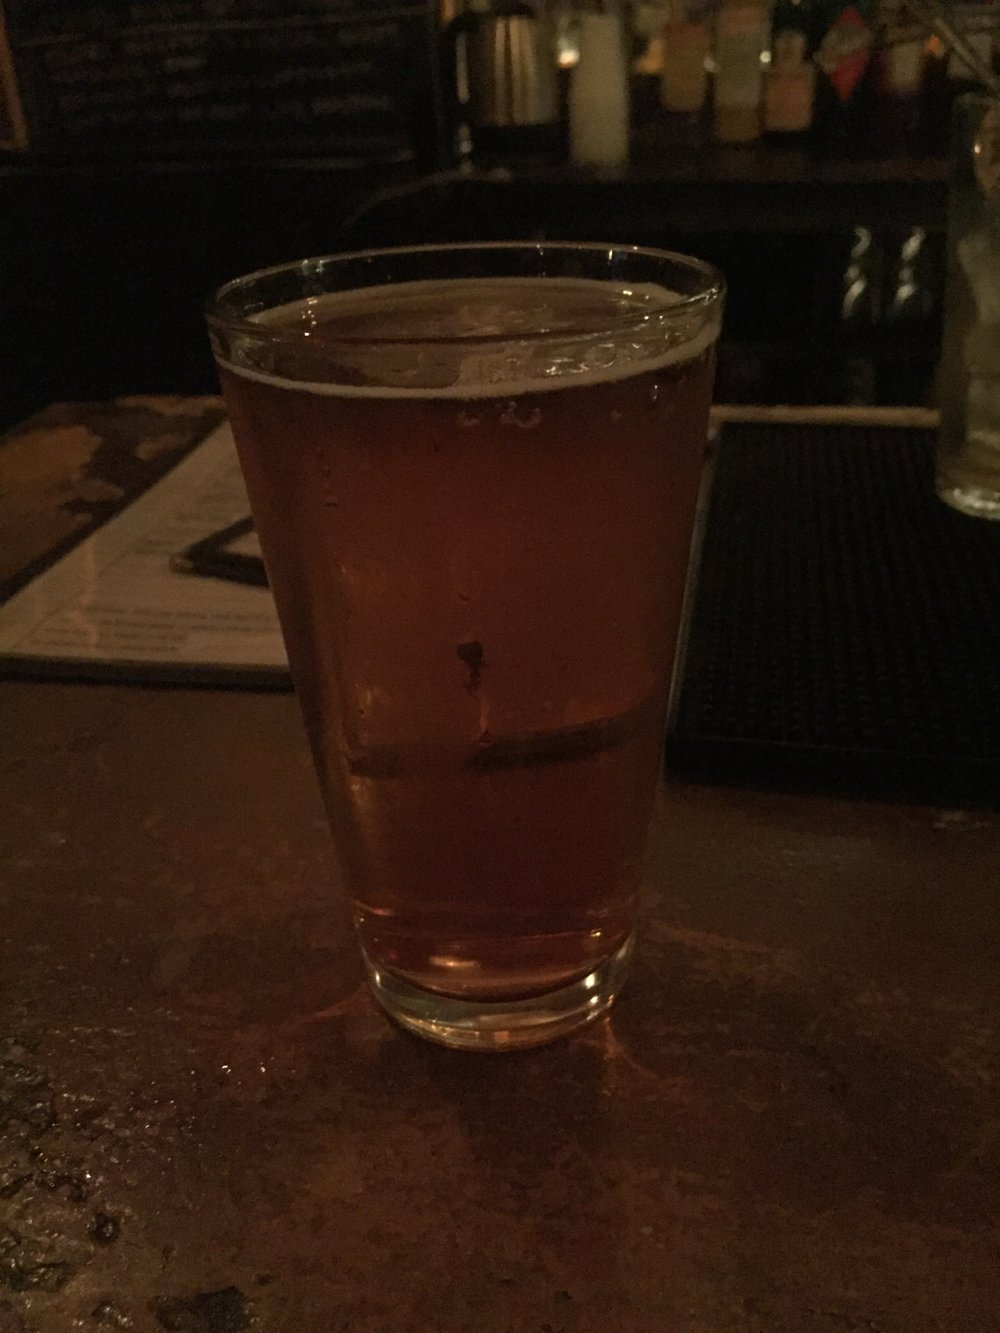 A pale ale at Burnside